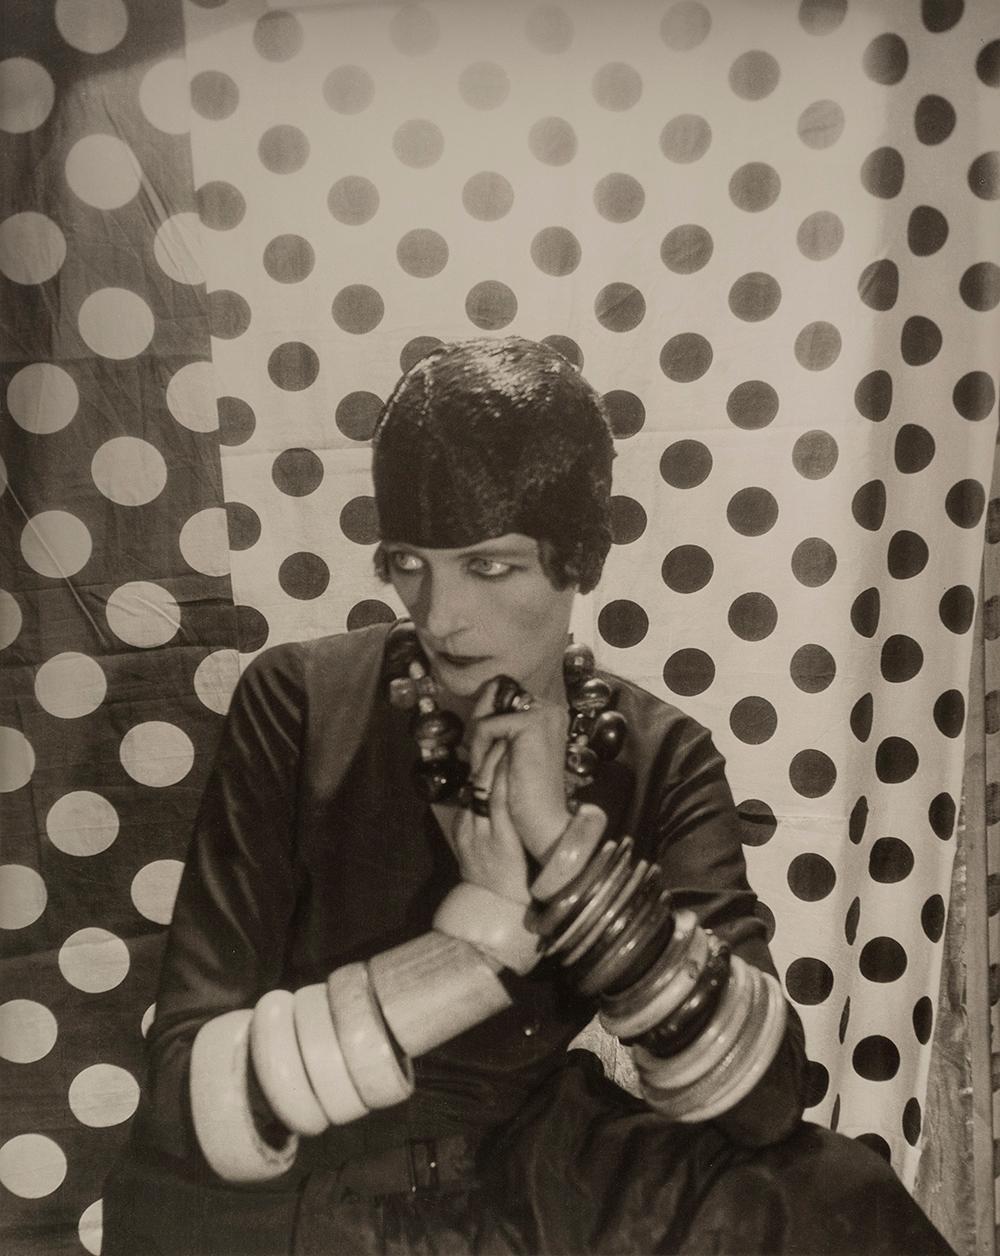 British society photographer Cecil Beaton Nancy Cunard portrait Huxley-Parlour gallery